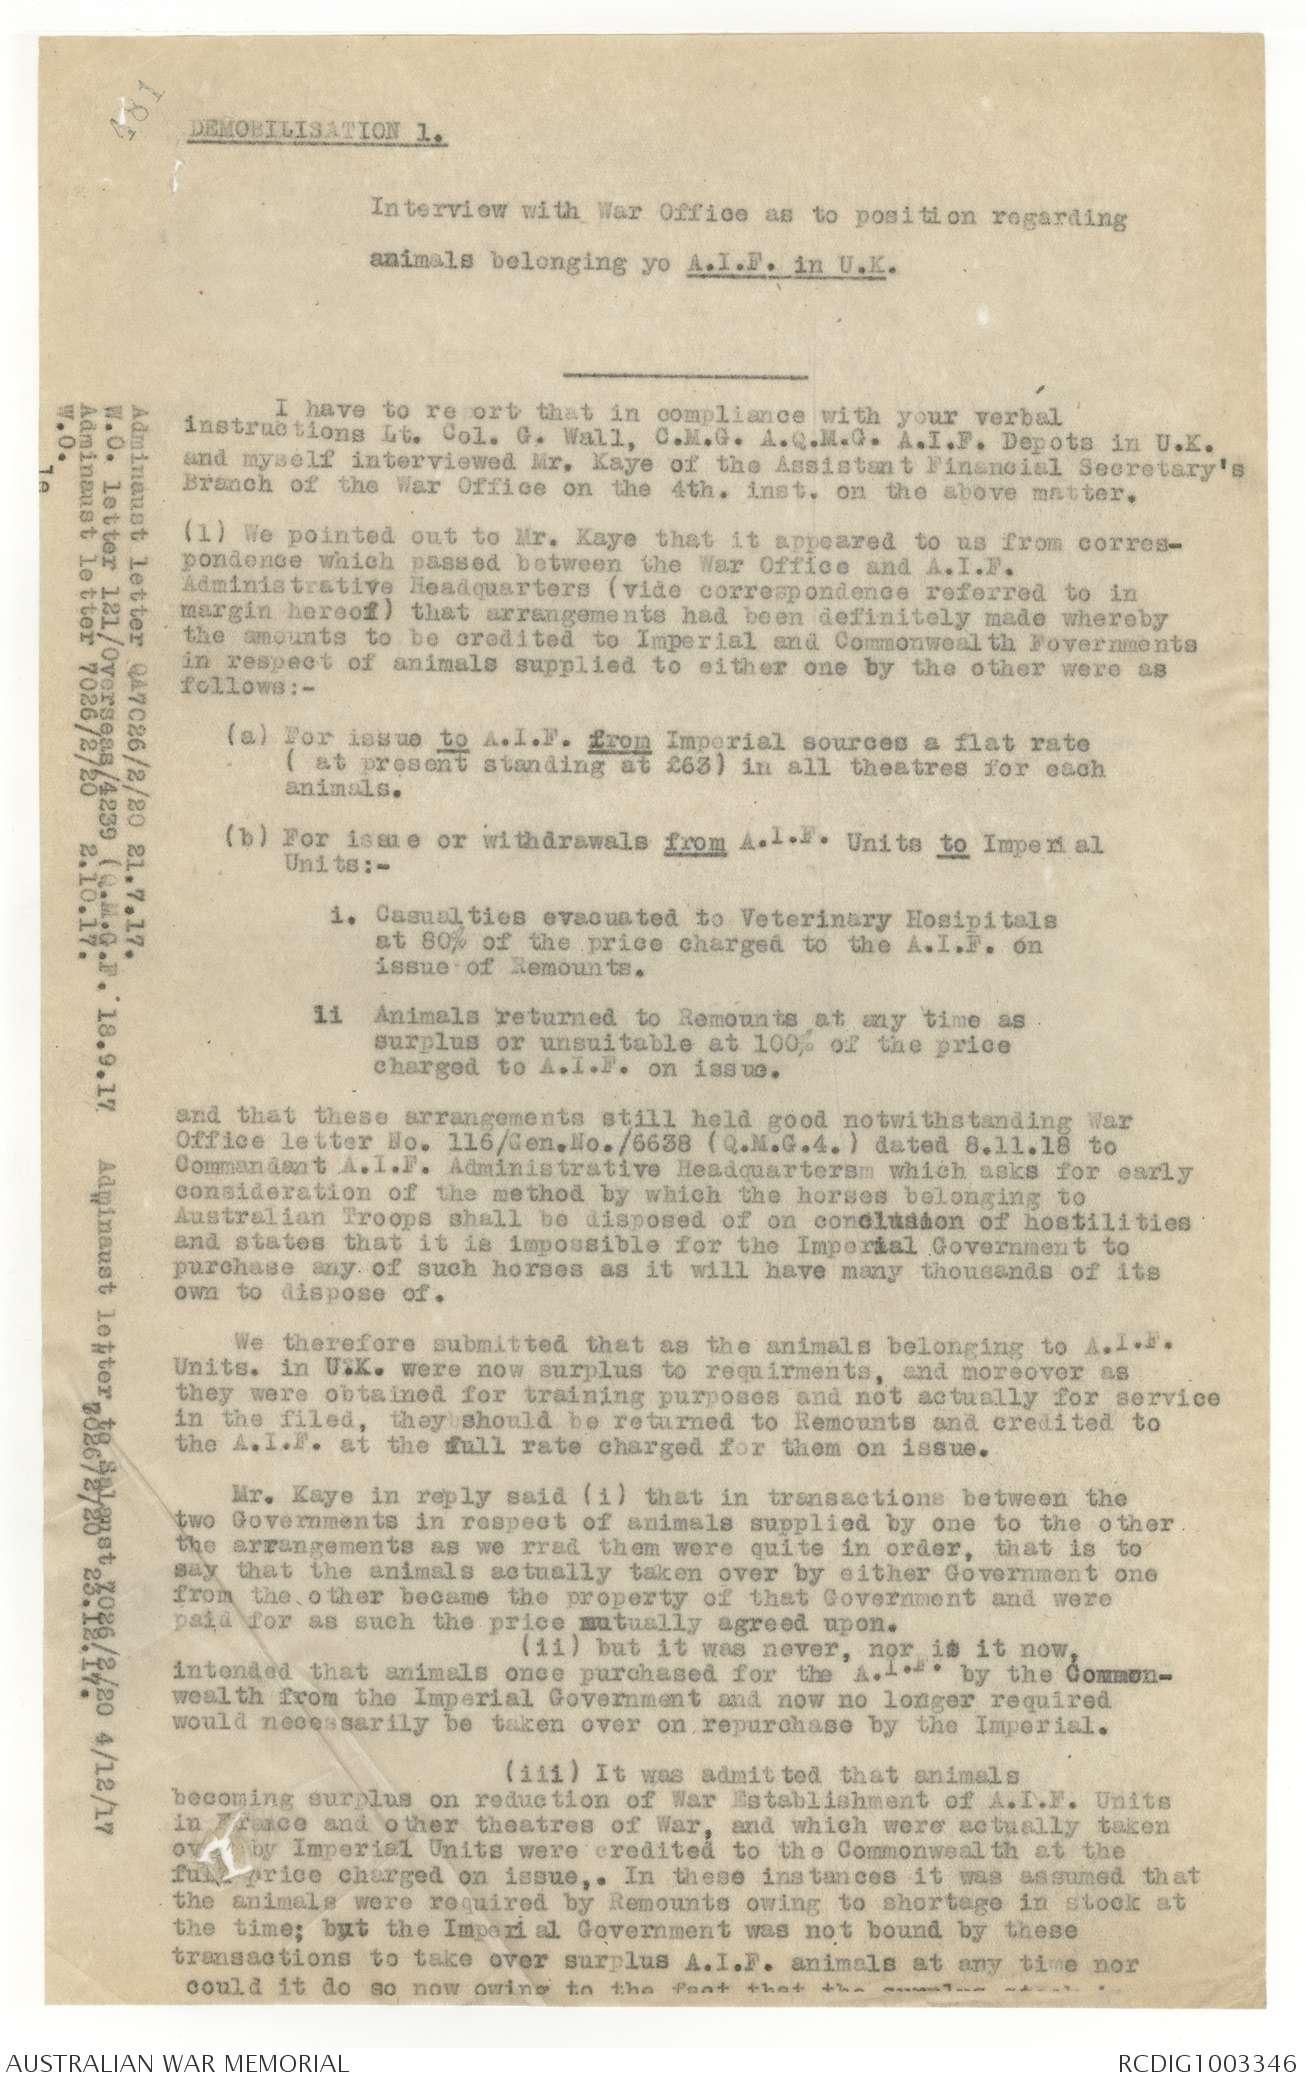 AWM4 30/1/4 PART 9 - January 1919 | The Australian War Memorial